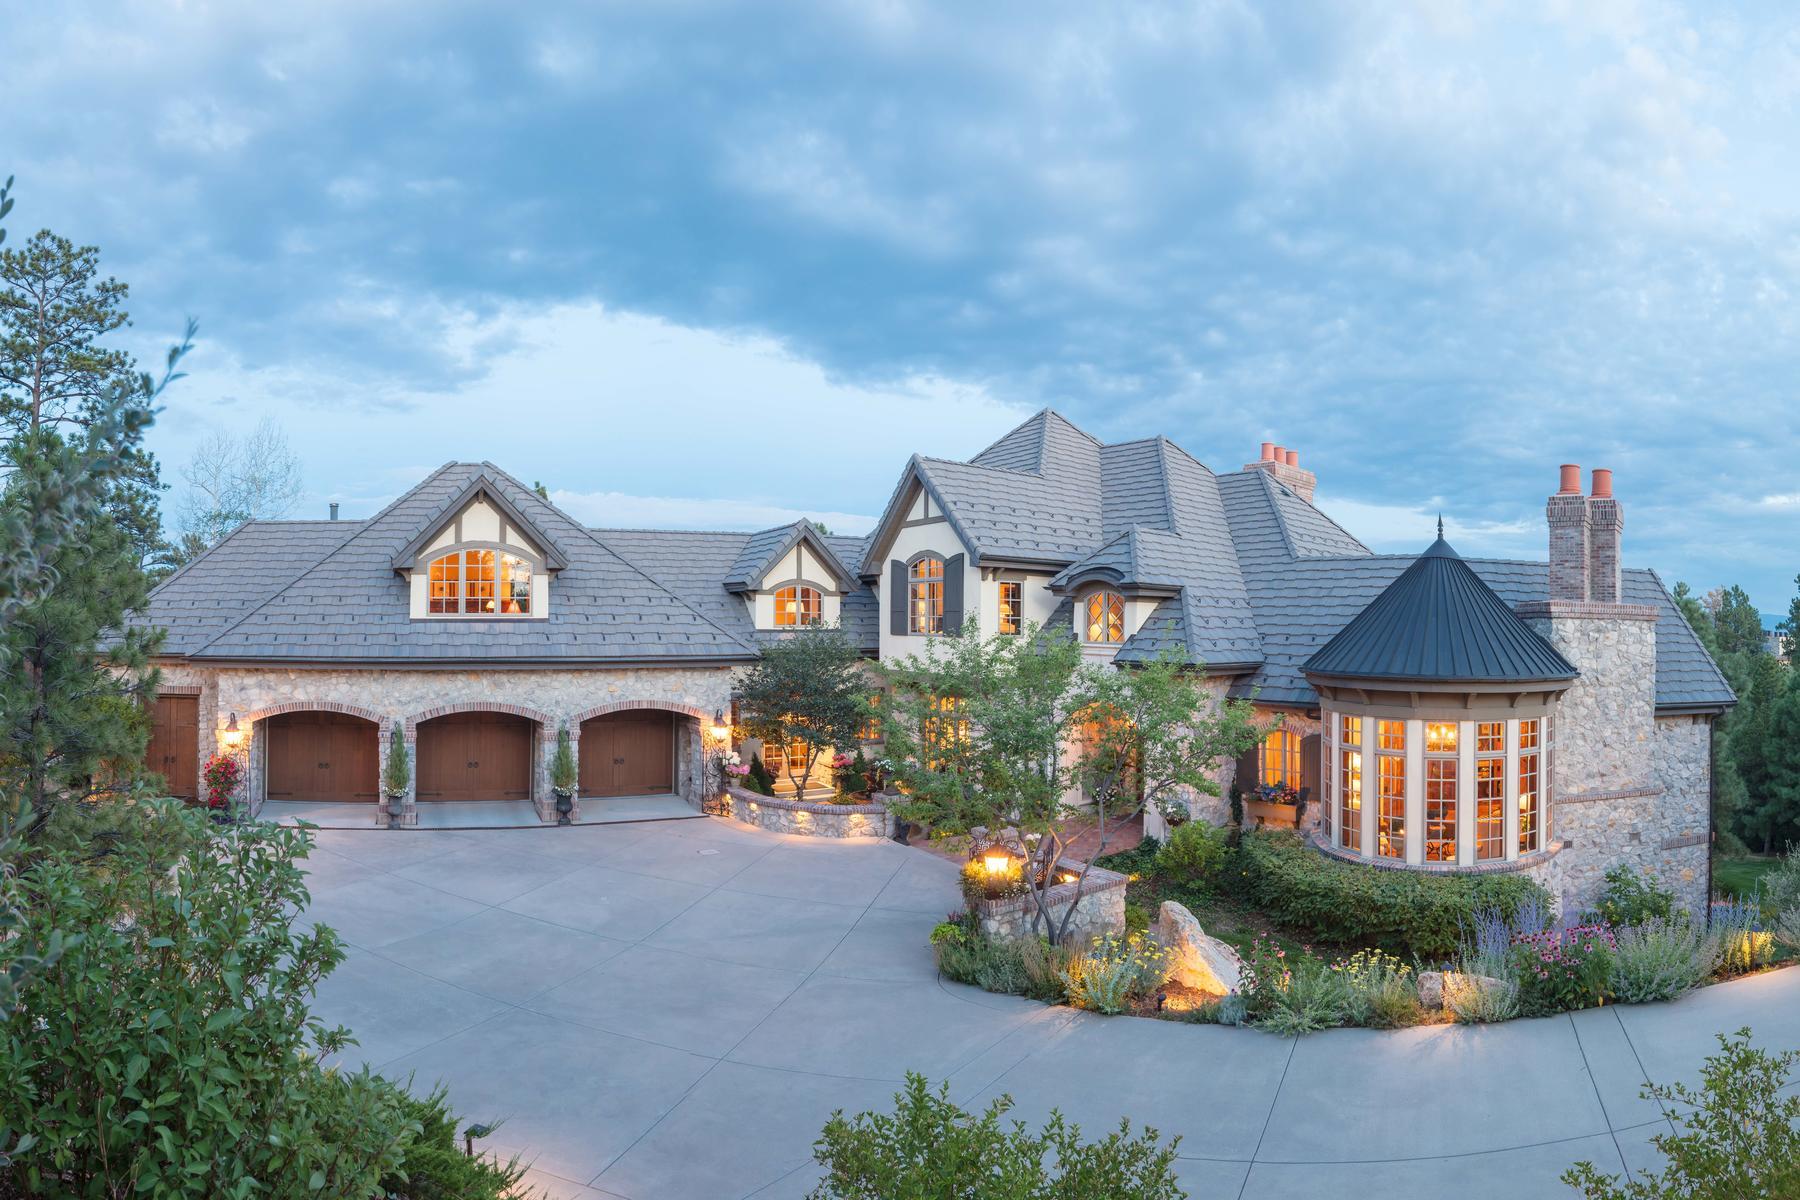 Single Family Home for Active at 4 Eagle Pointe Lane 4 Eagle Pointe Lane Castle Rock, Colorado 80108 United States